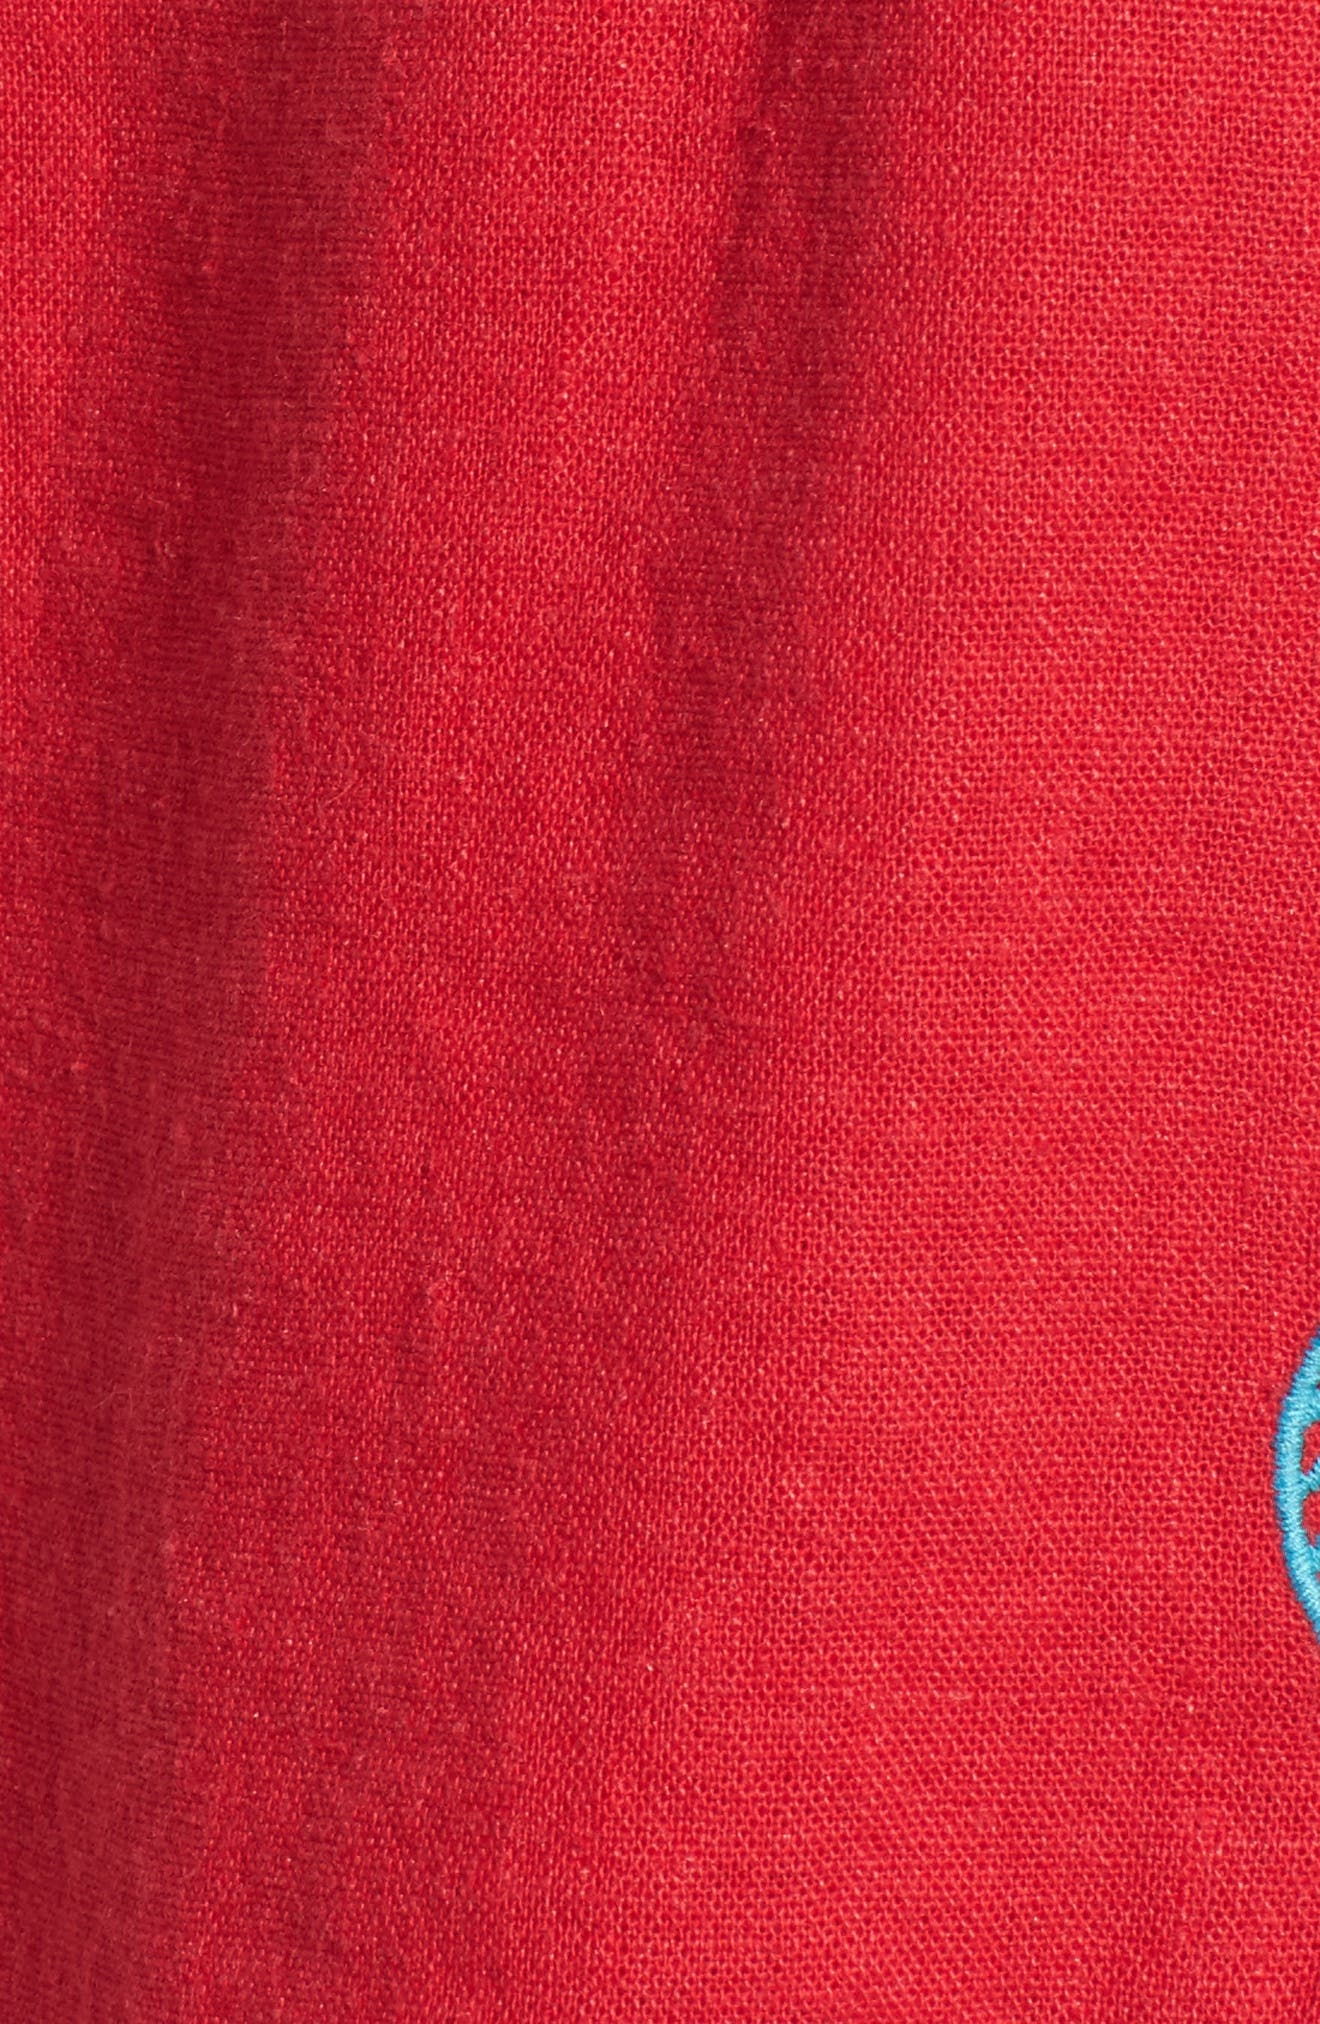 Embroidered Linen Blend Shorts,                             Alternate thumbnail 5, color,                             610